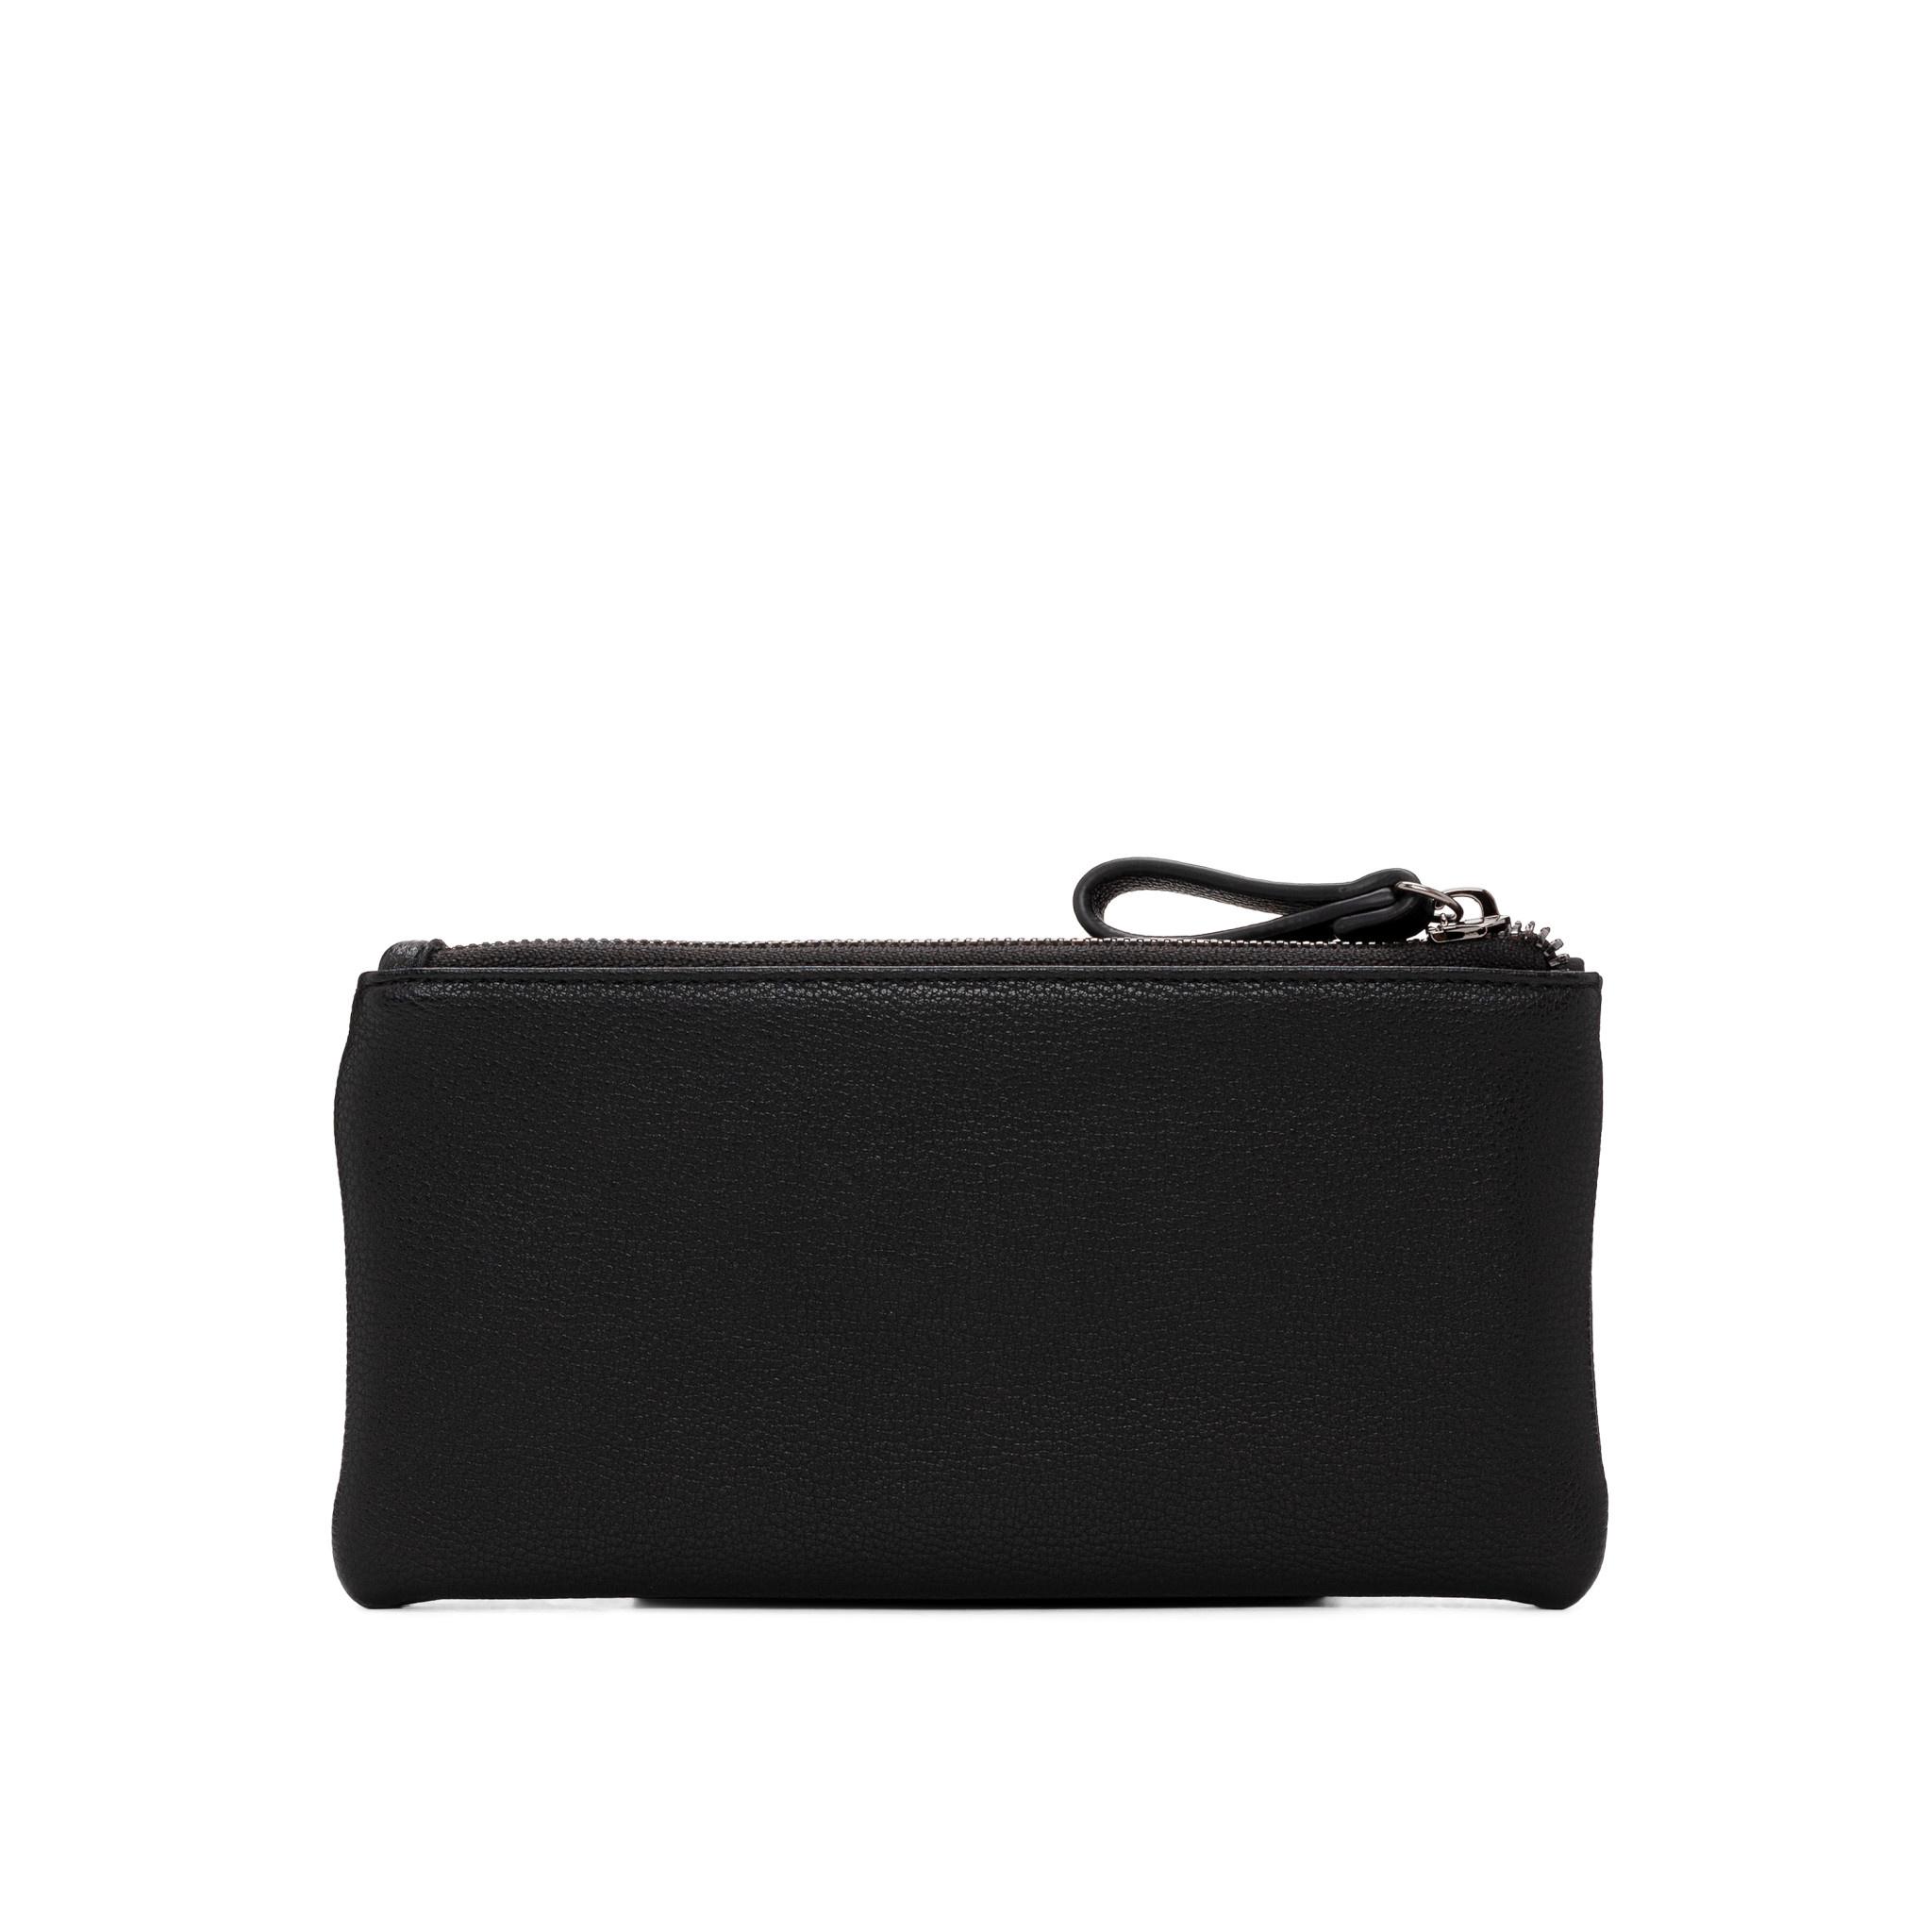 Colab Colab Suede PU Wallet w/flap (#6508) - Black